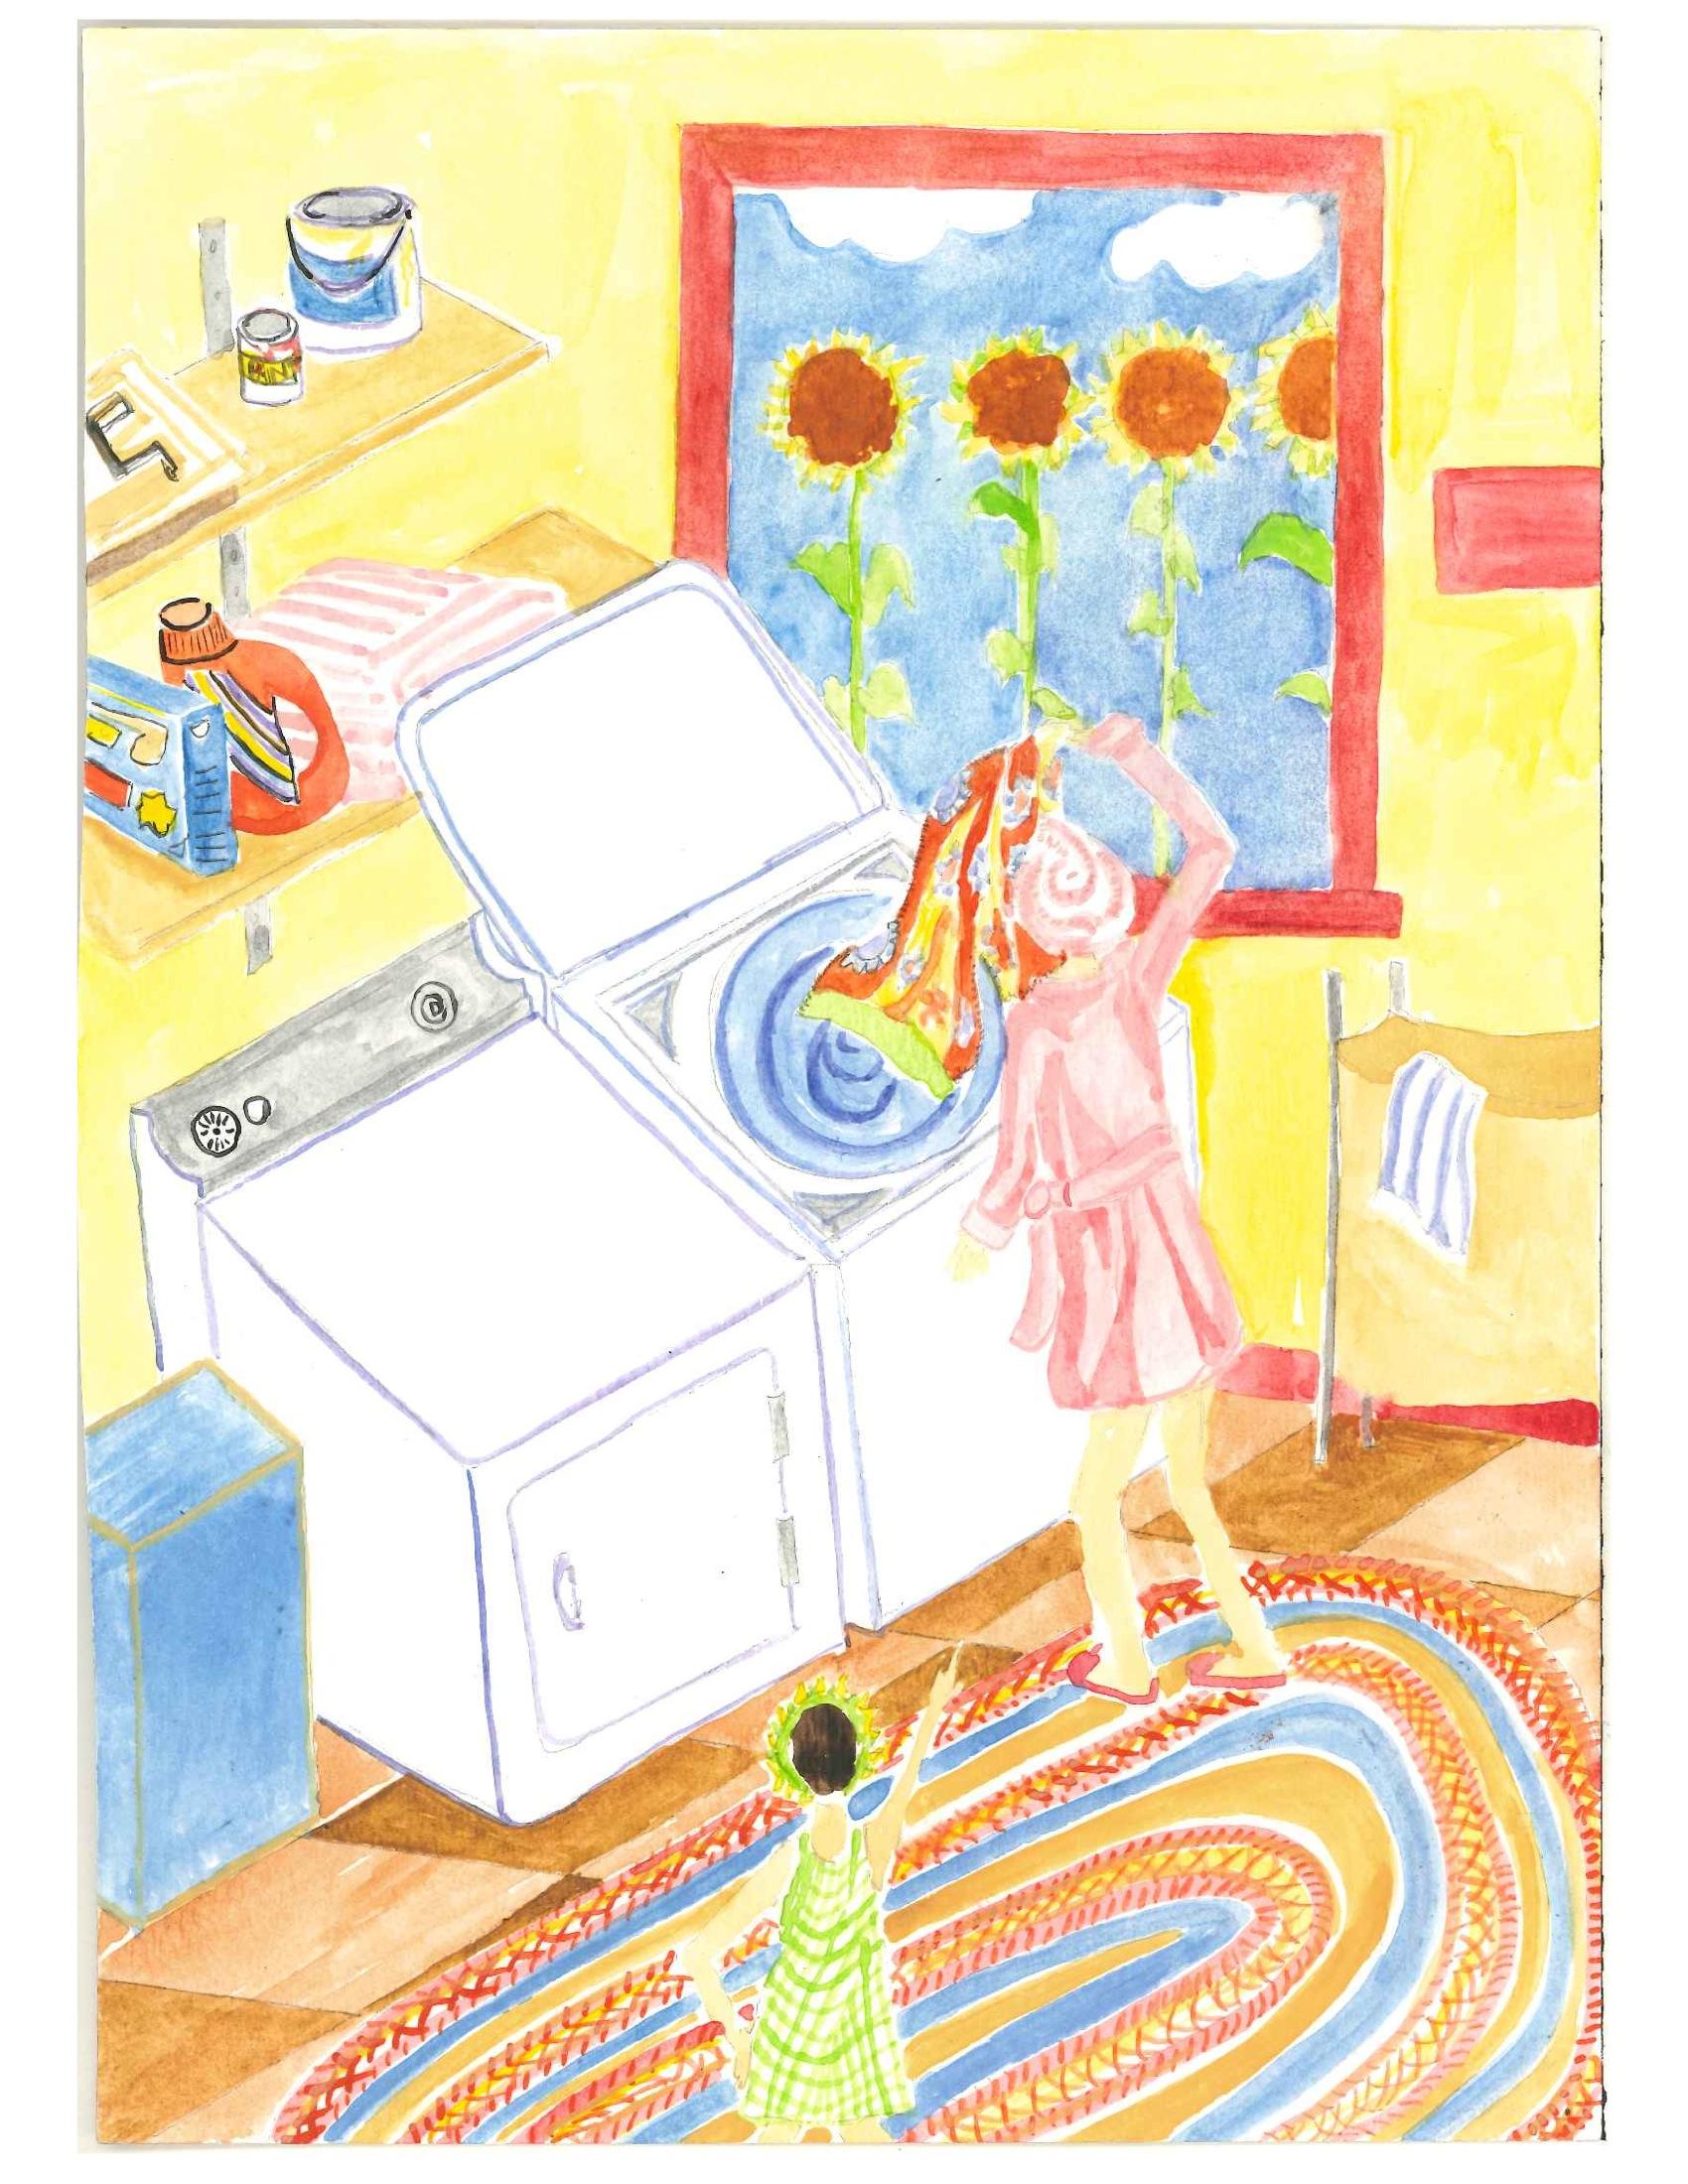 Green Queen doing laundry